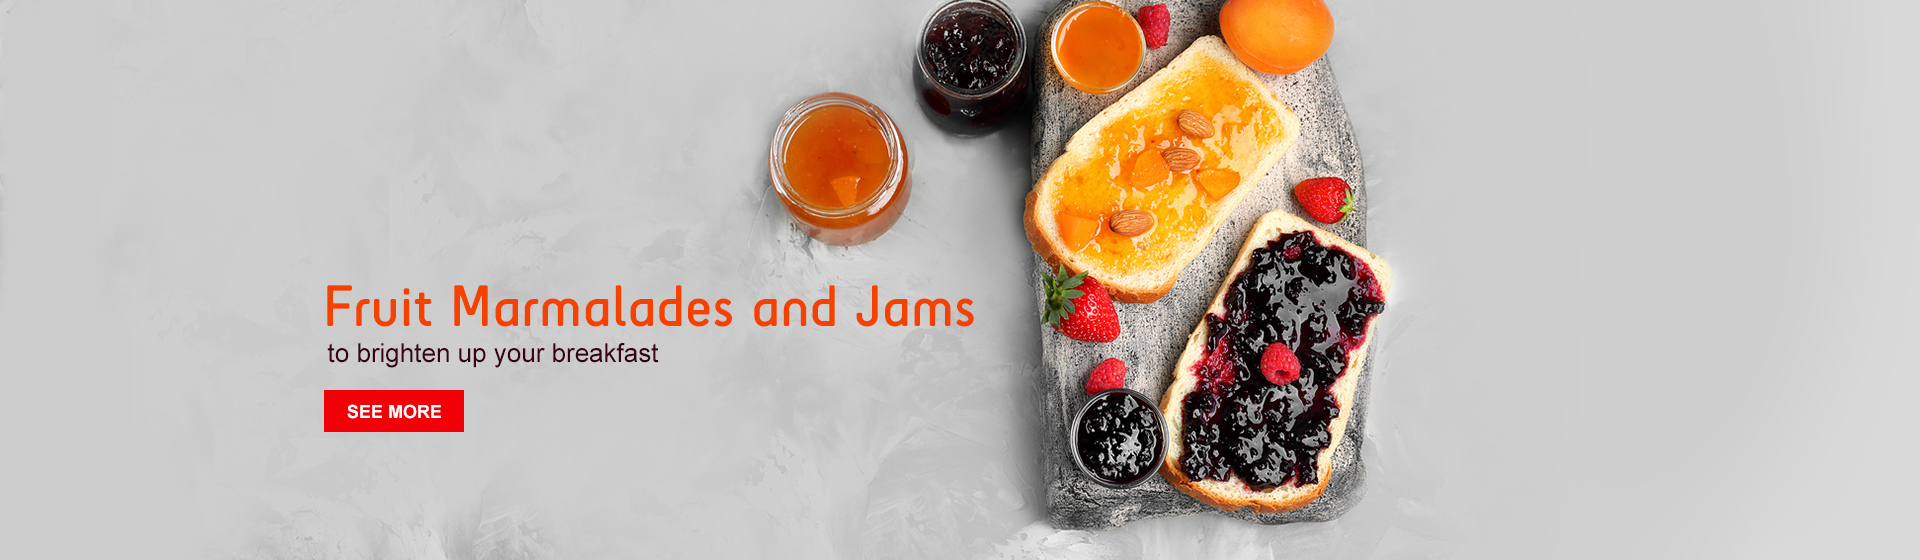 Fruit Marmalades and Jams